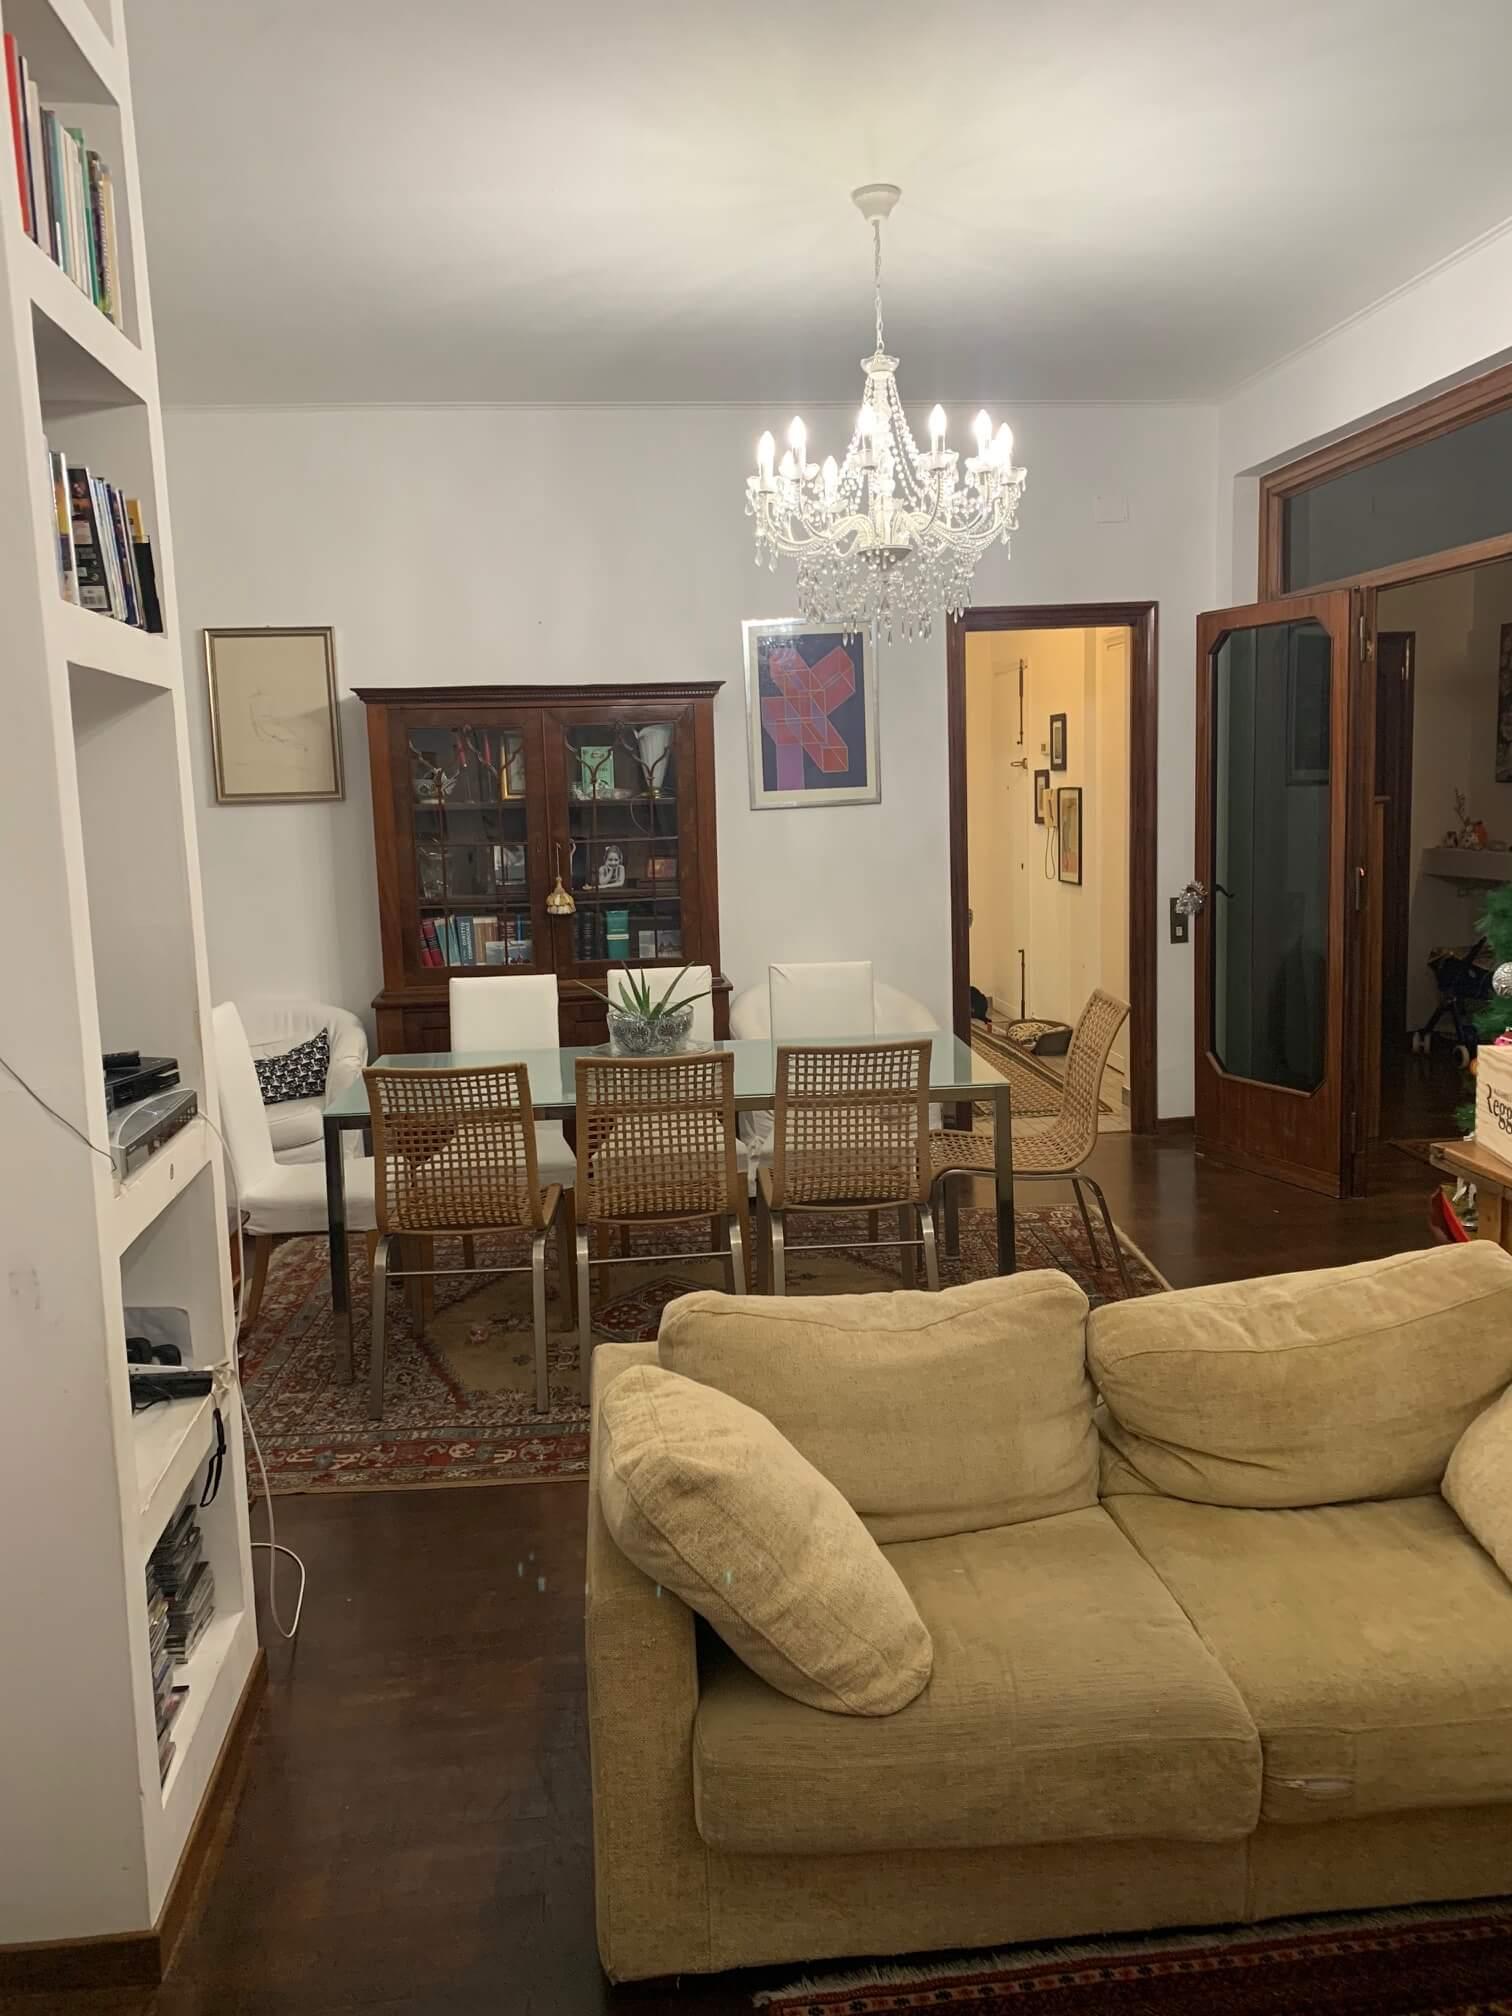 Appartamento signorile zona Balduina